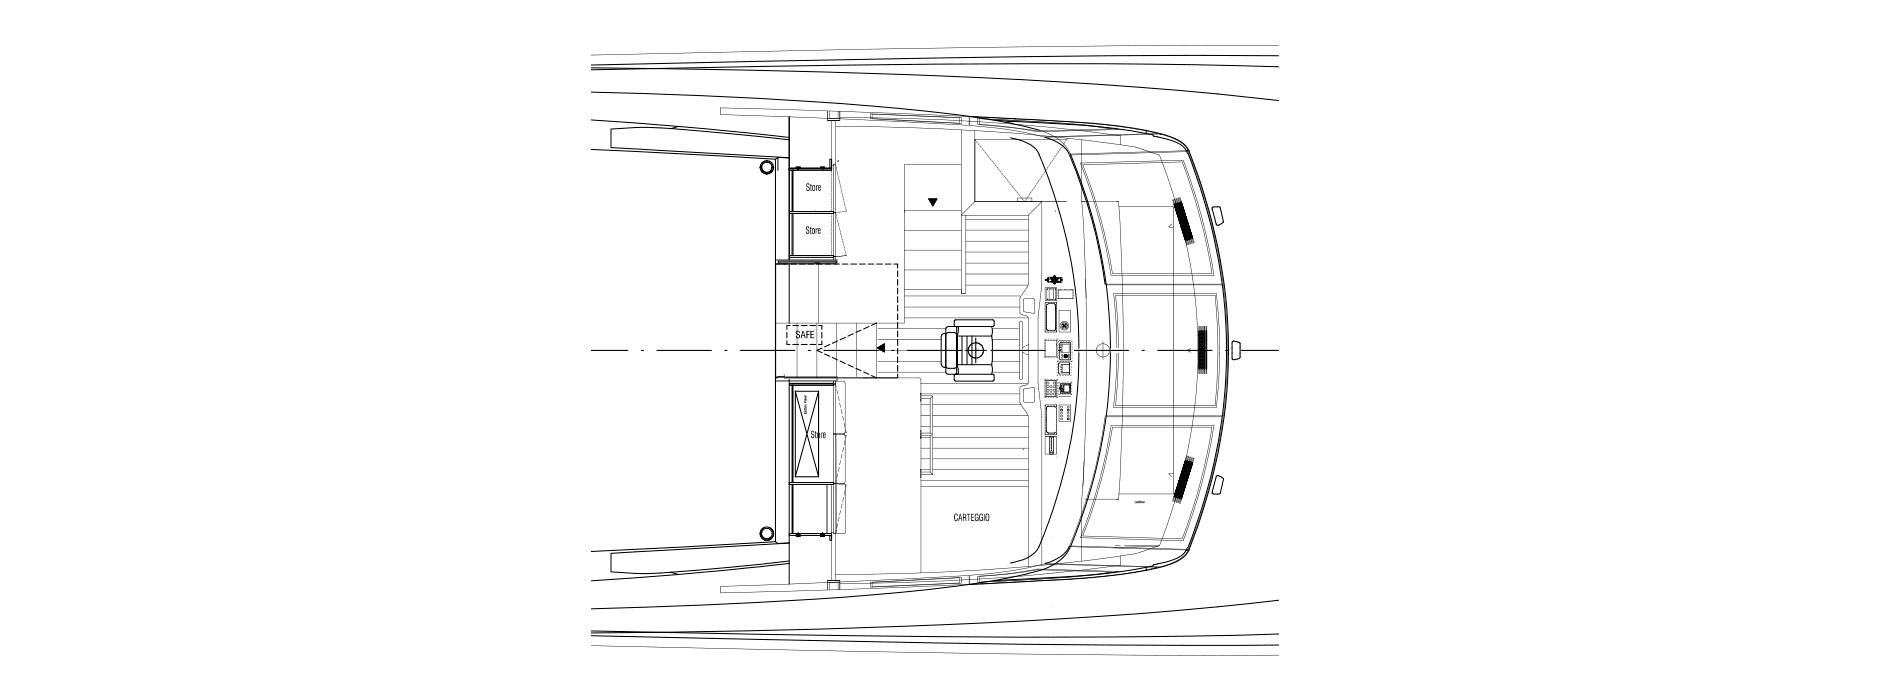 Sanlorenzo Yachts SL96-684 Details